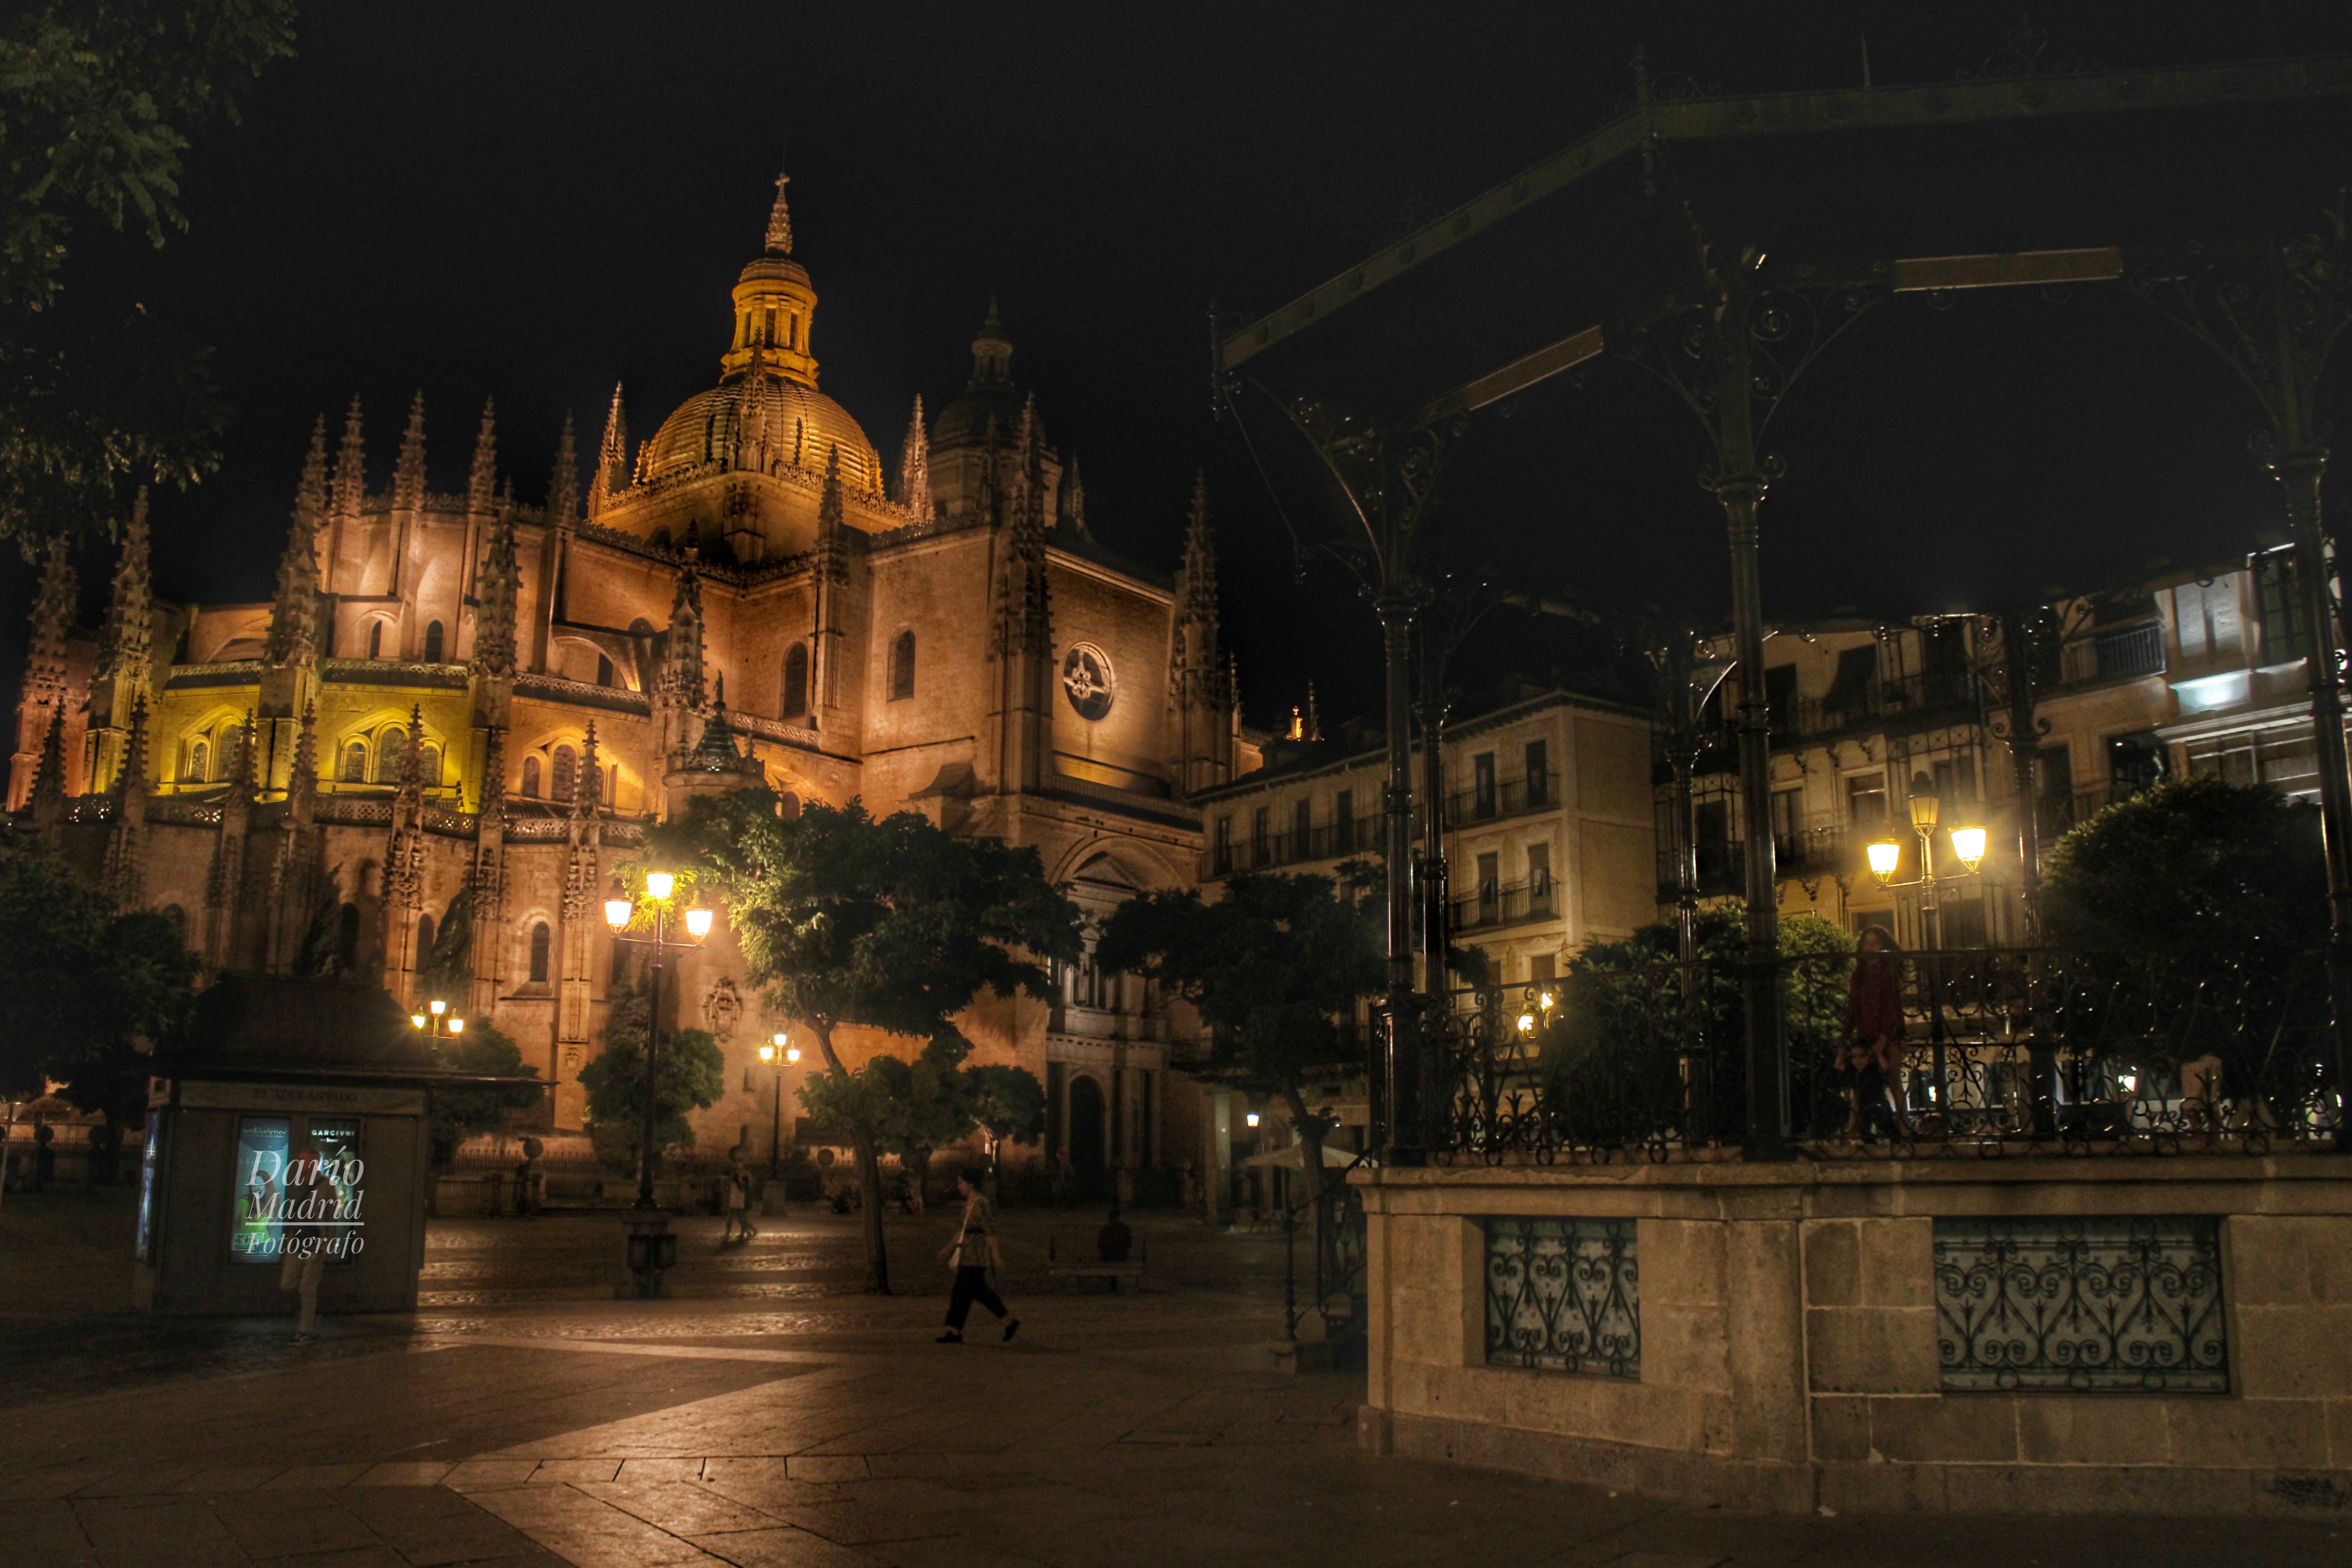 Nocturno de la Catedral de Segovia